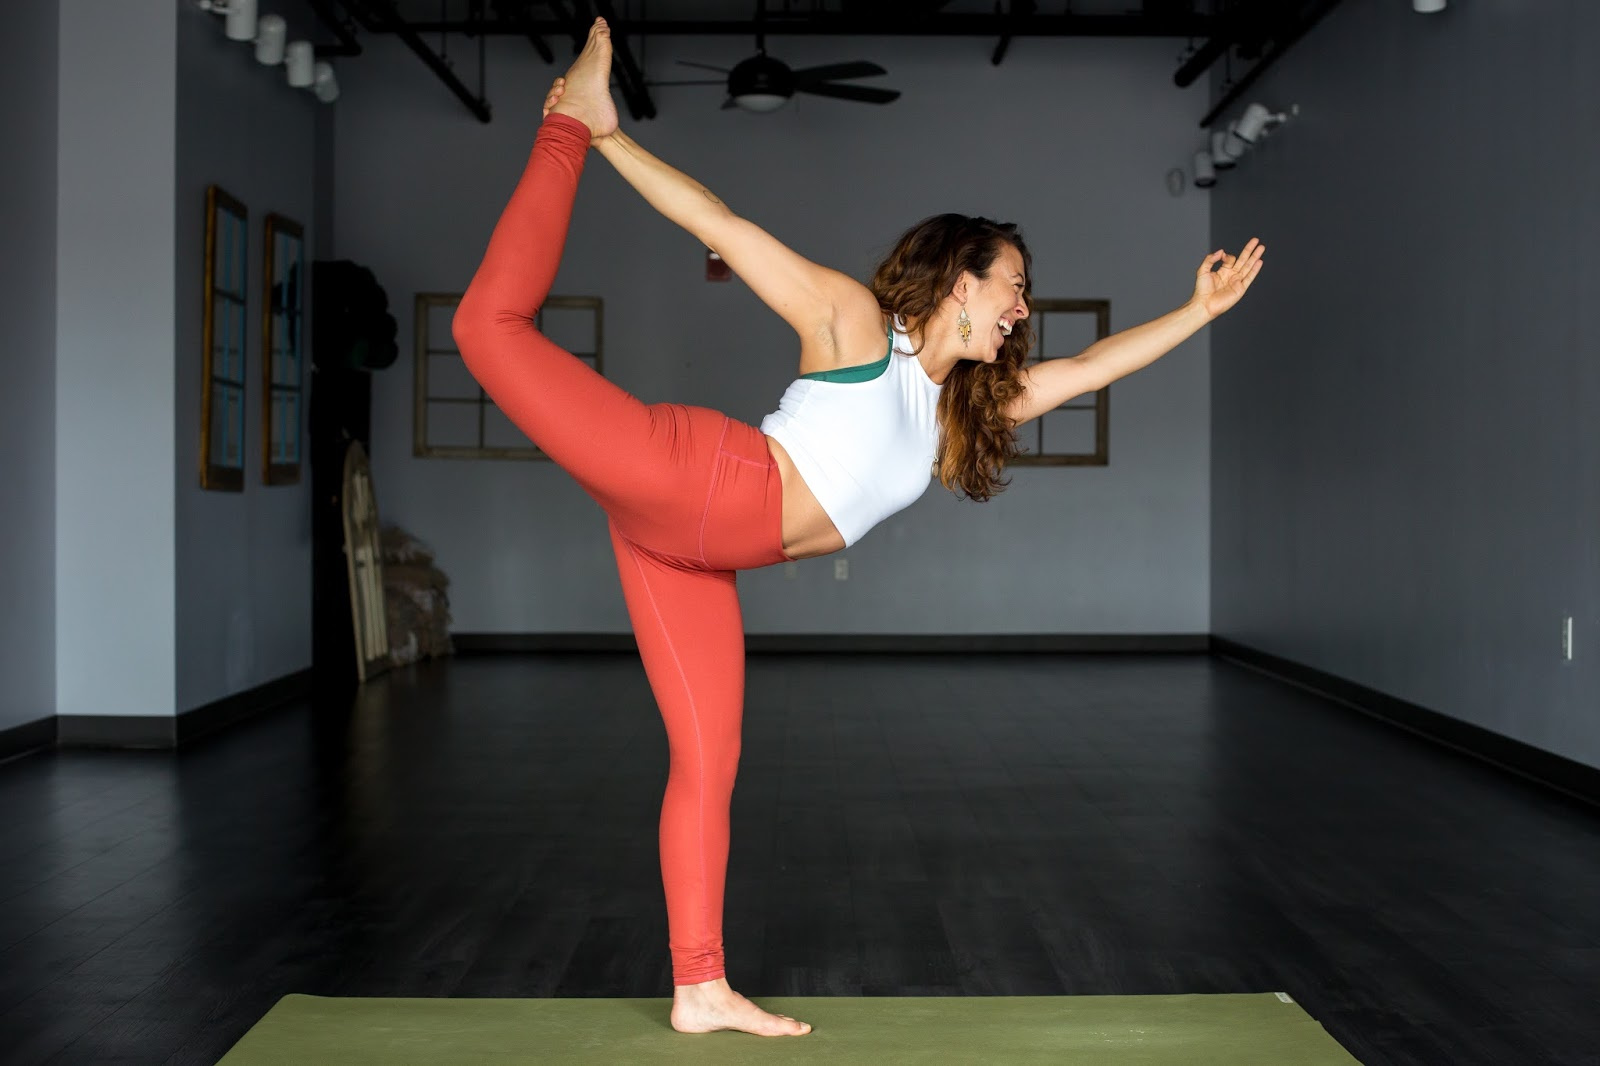 sandi moynihan multimedia summertime mini session fun for yoga